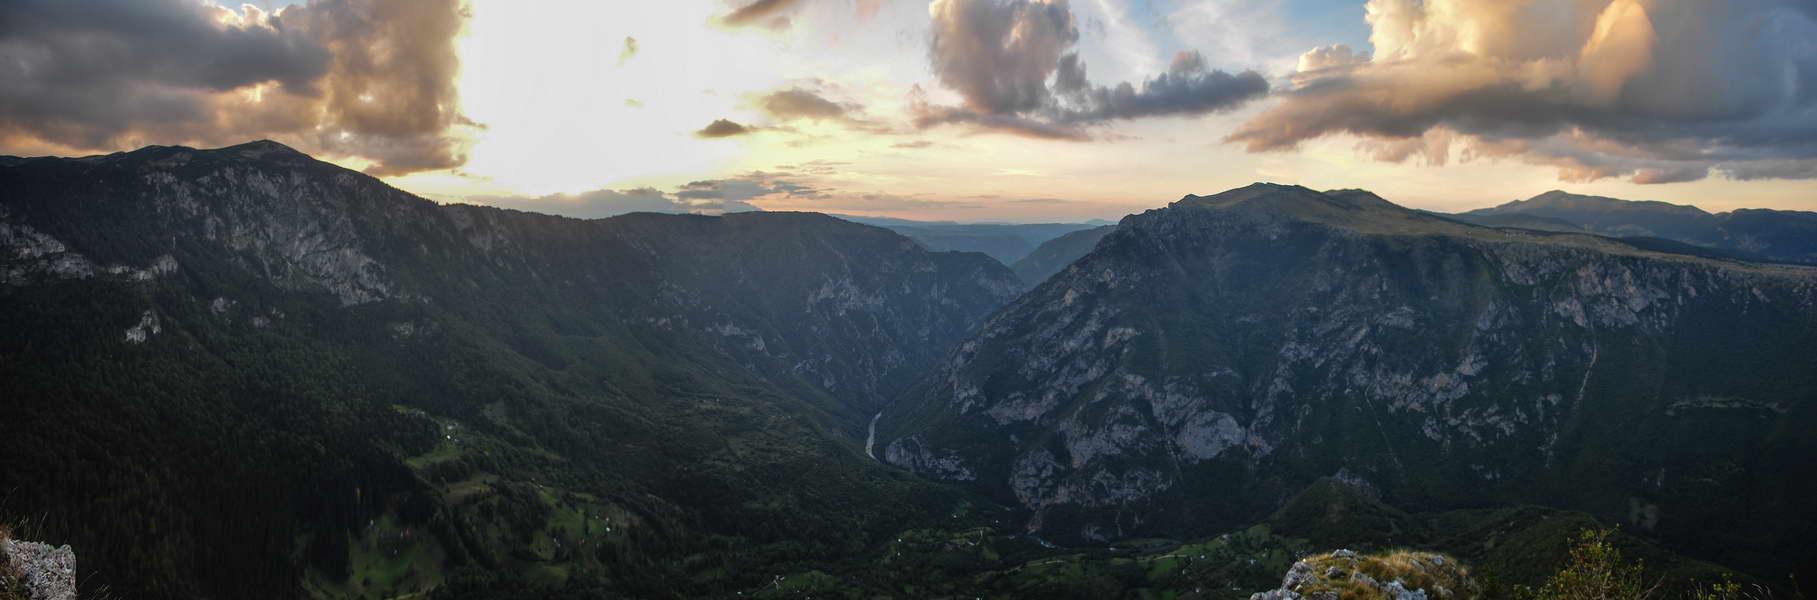 Kanjon Tare sa Ćurovca